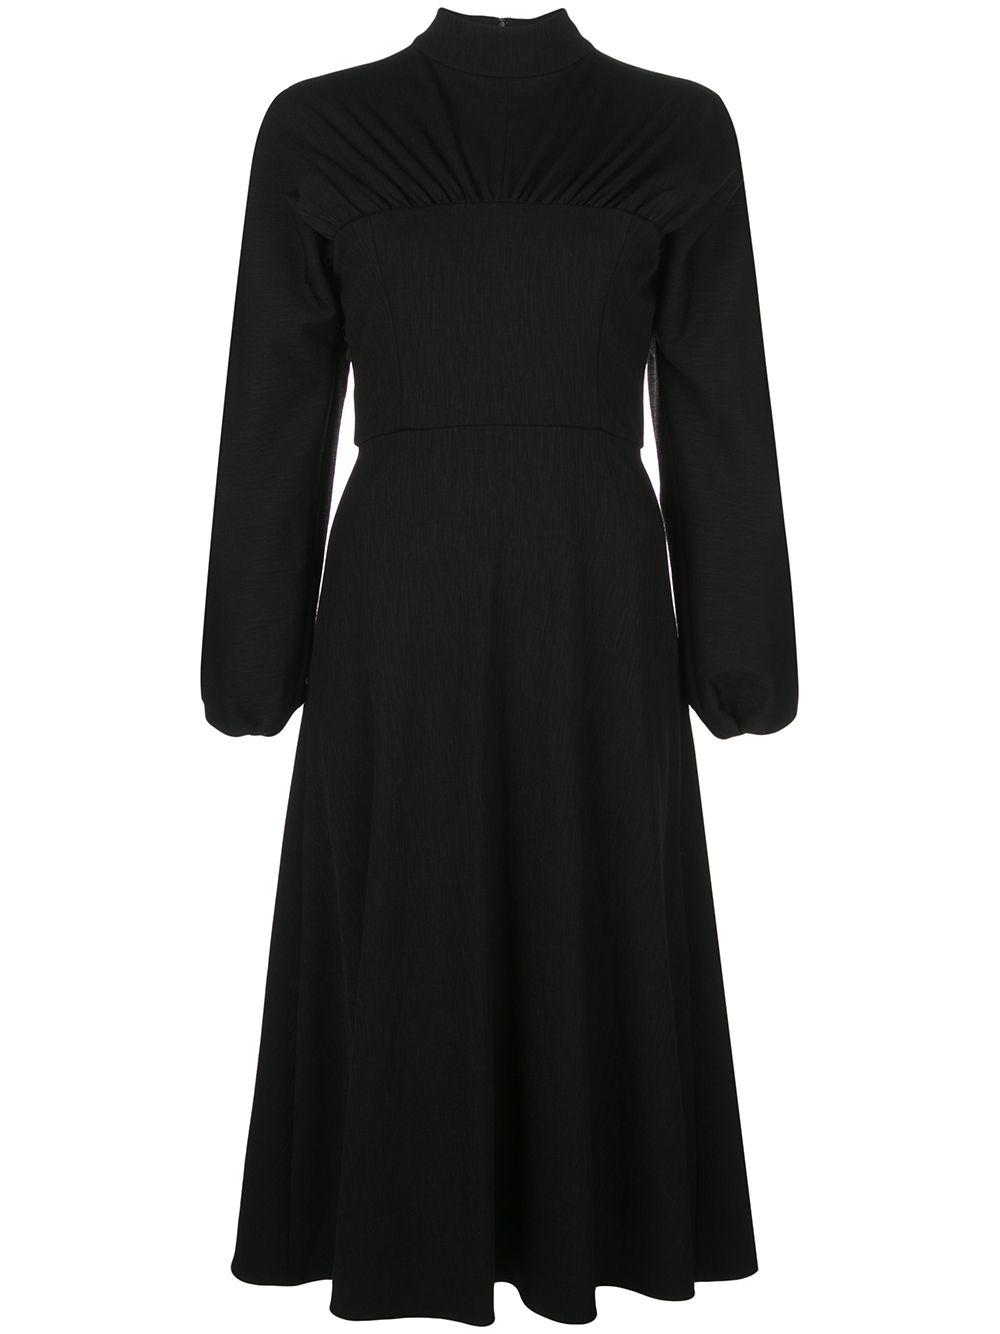 Image of Long Sleeve Mock Neck Dress